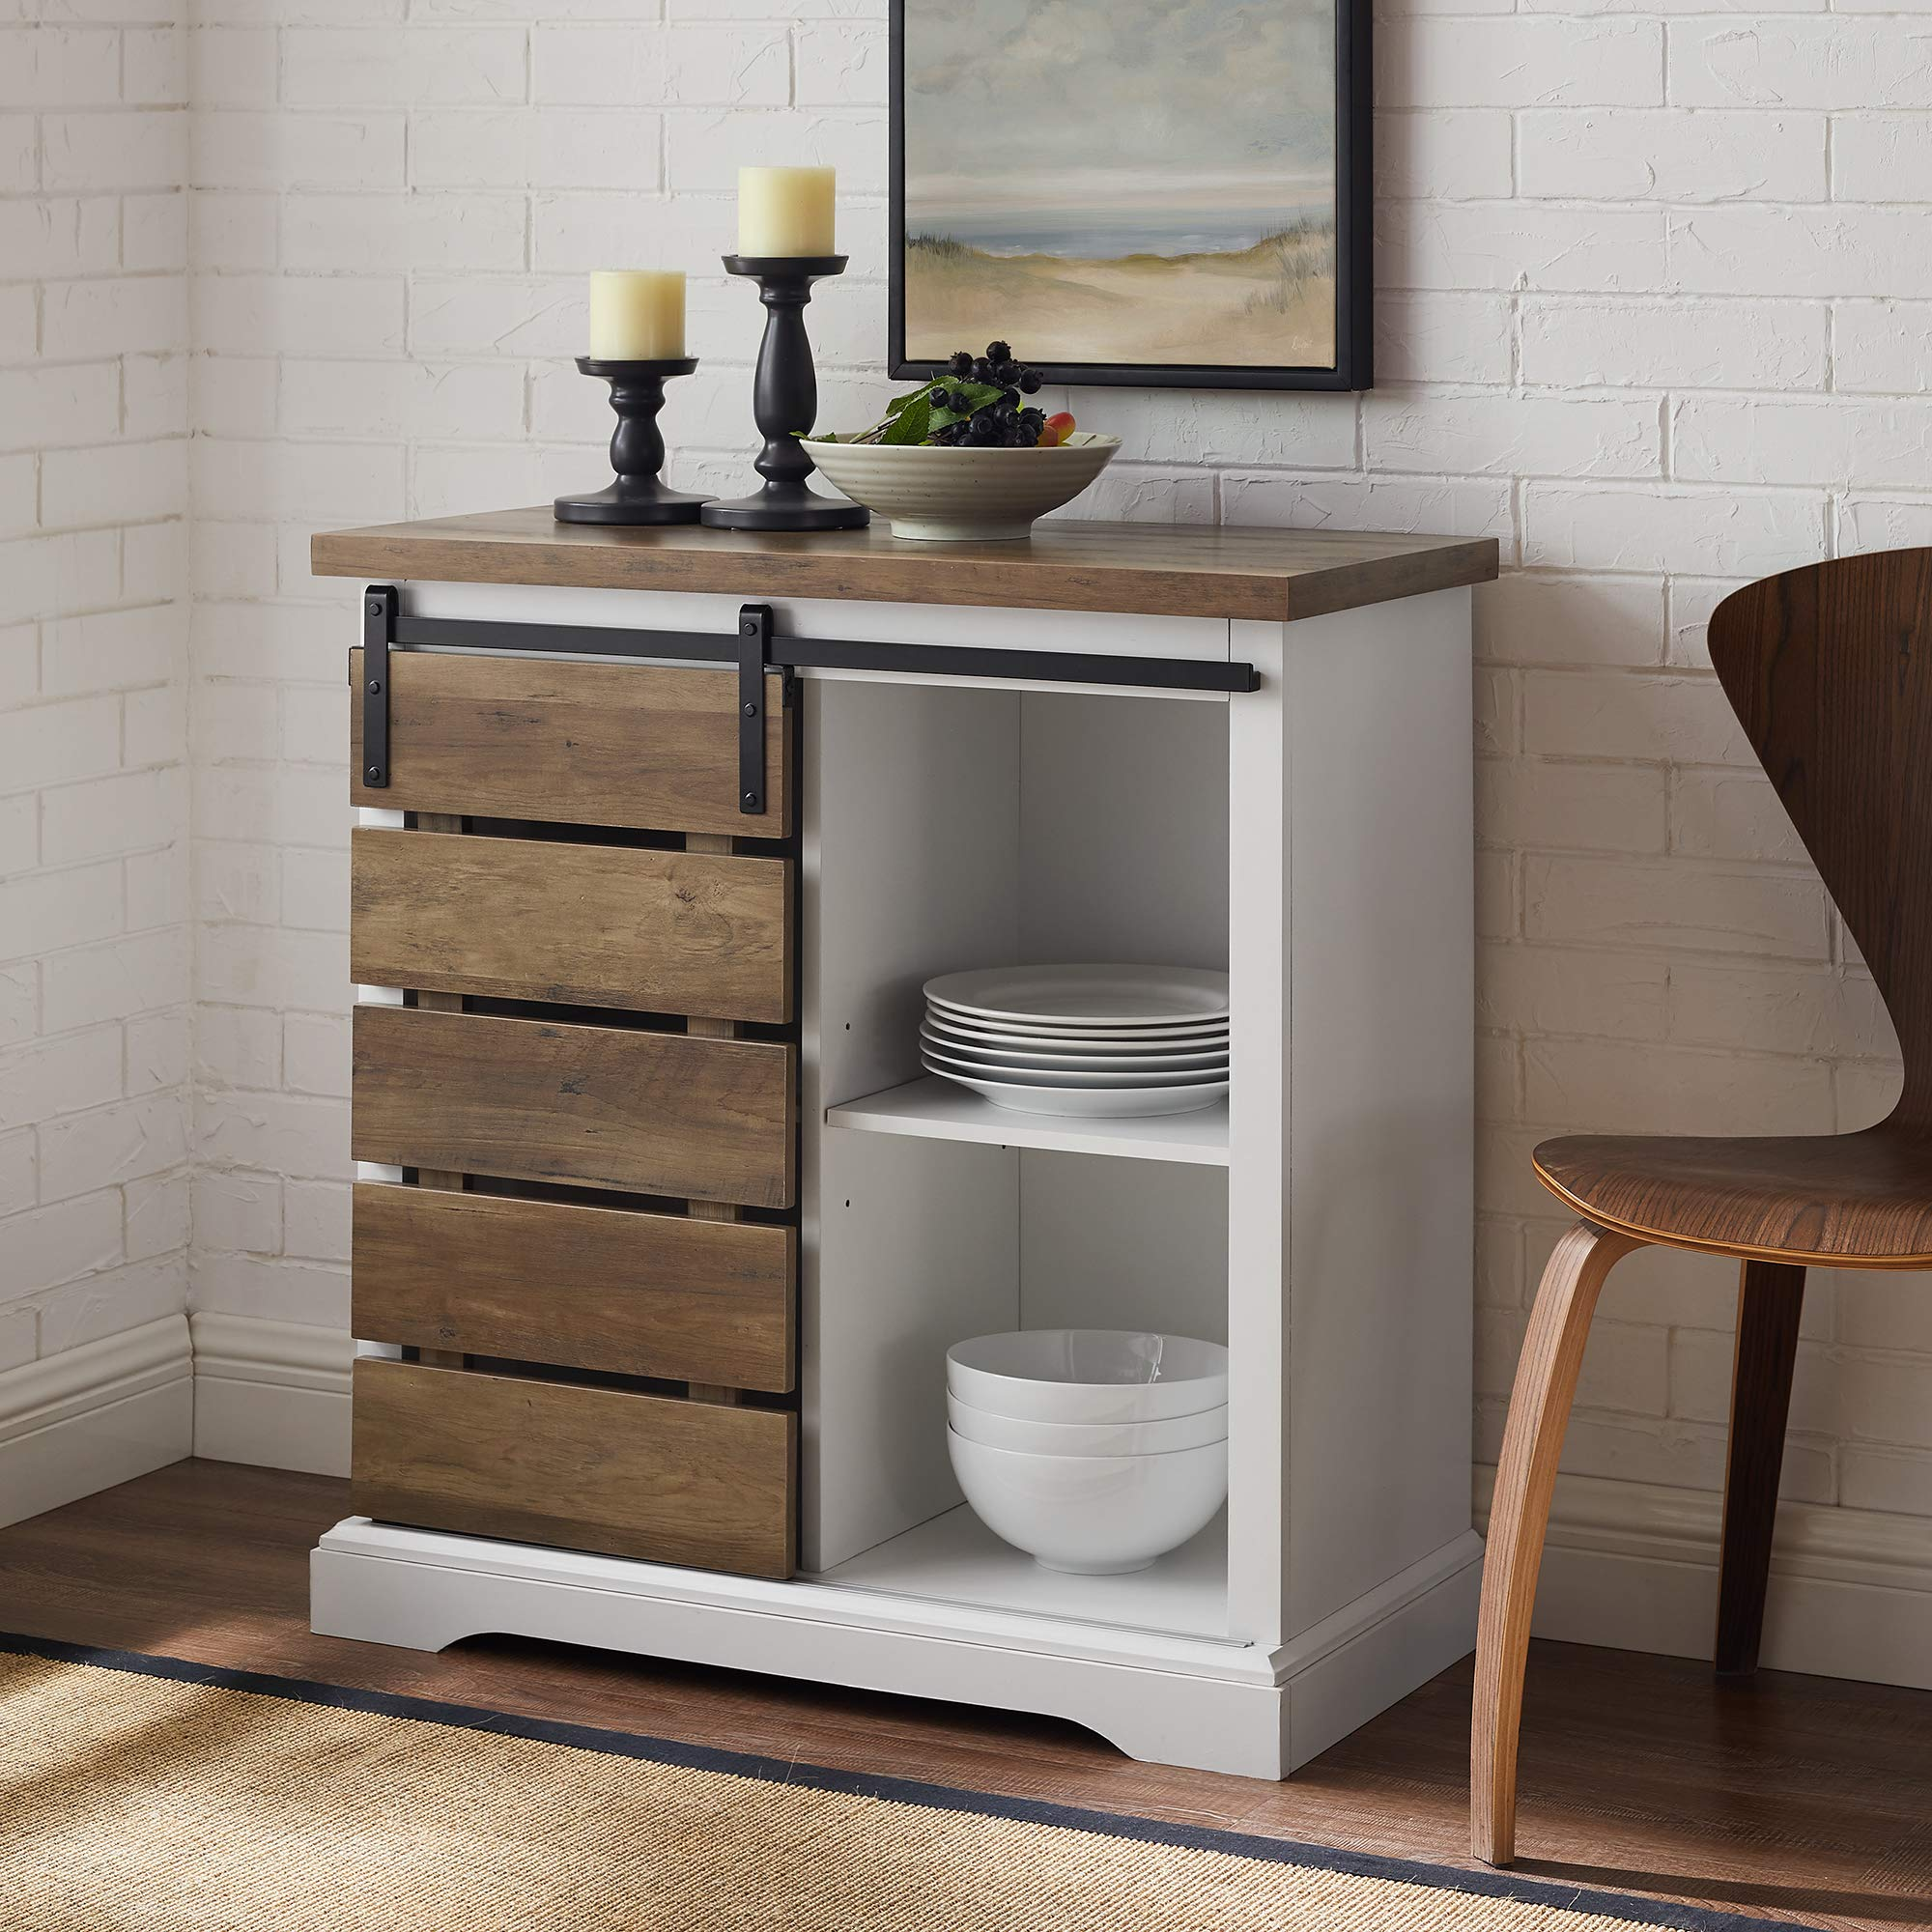 WE Furniture AZF32ALSDRO Buffet, 32'', Solid White/Rustic Oak by WE Furniture